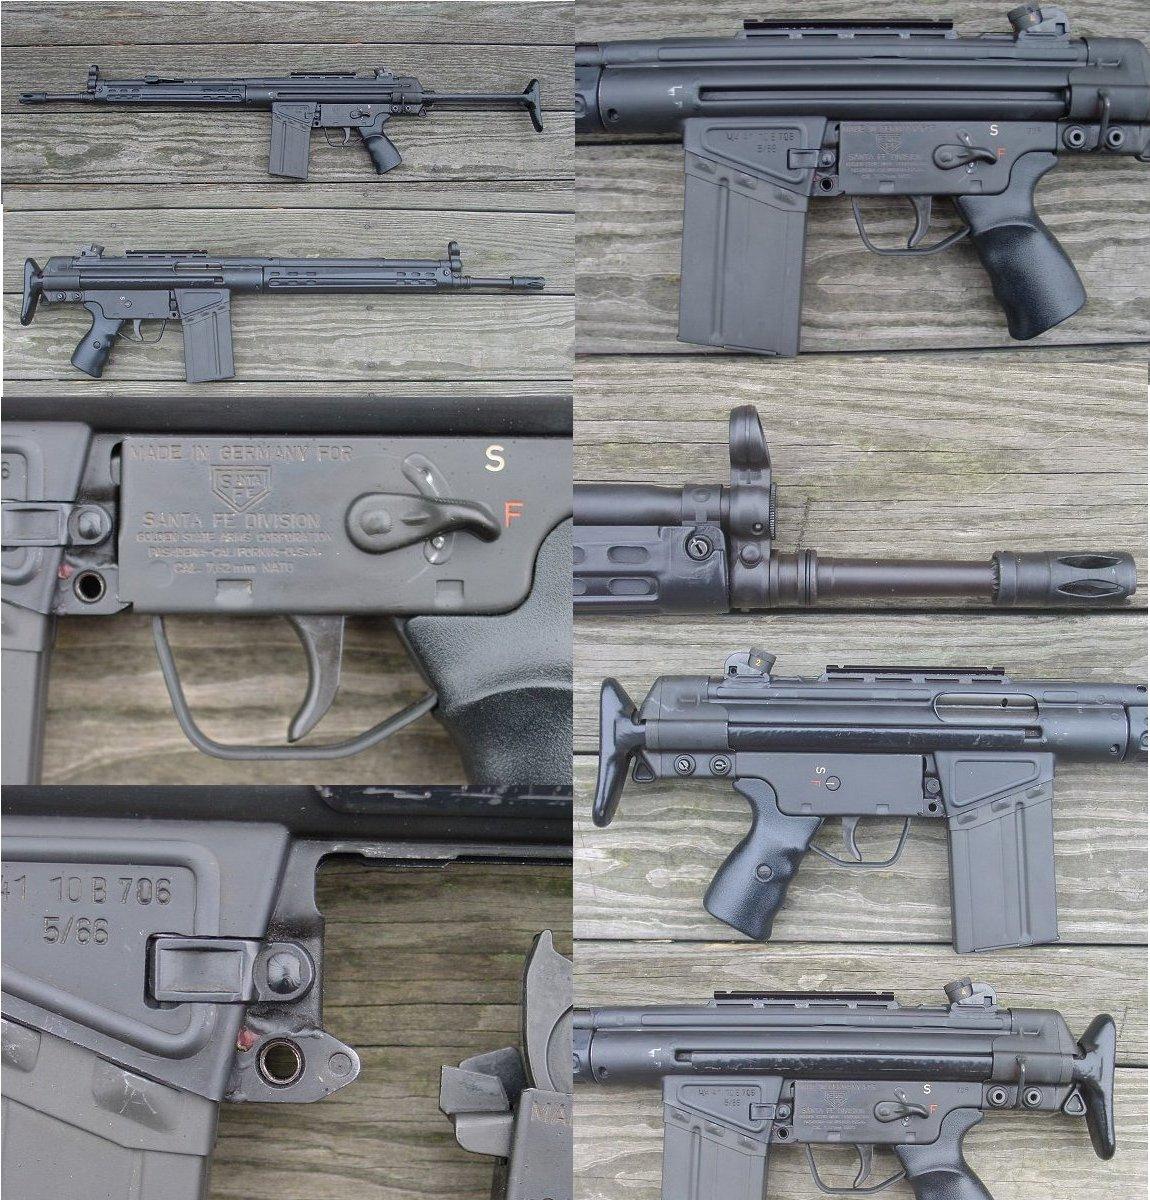 HK41_SantaFe66.jpg